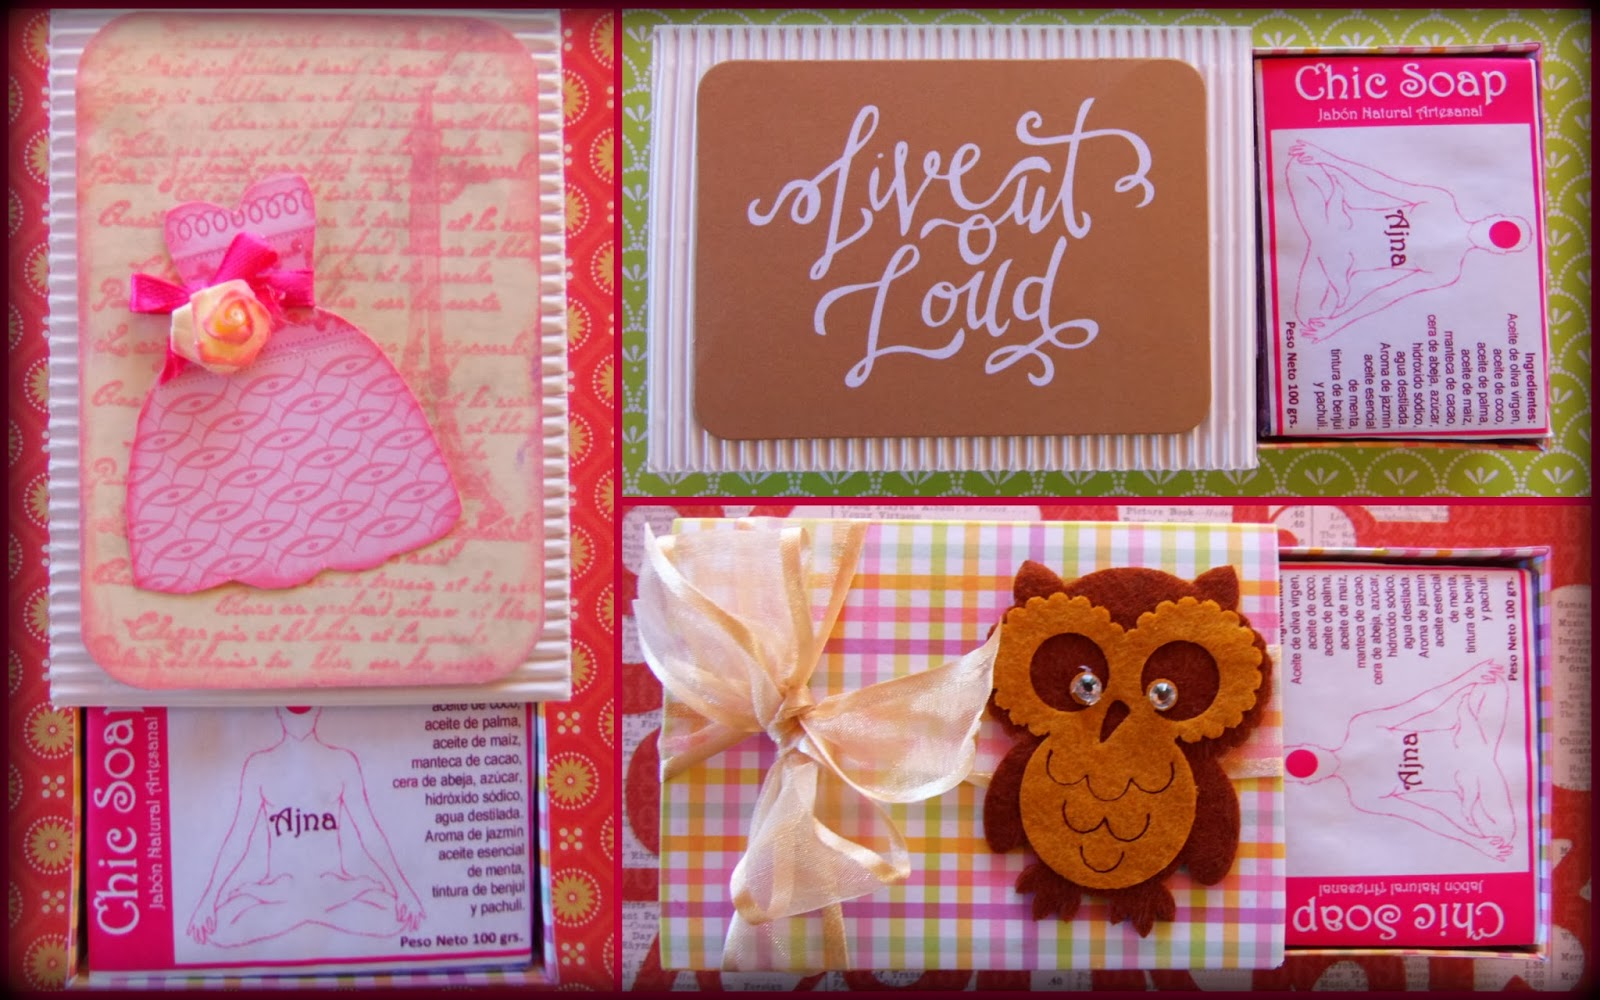 http://www.chic-soap.com/2014/01/caja-de-cerillas-matchbox.html